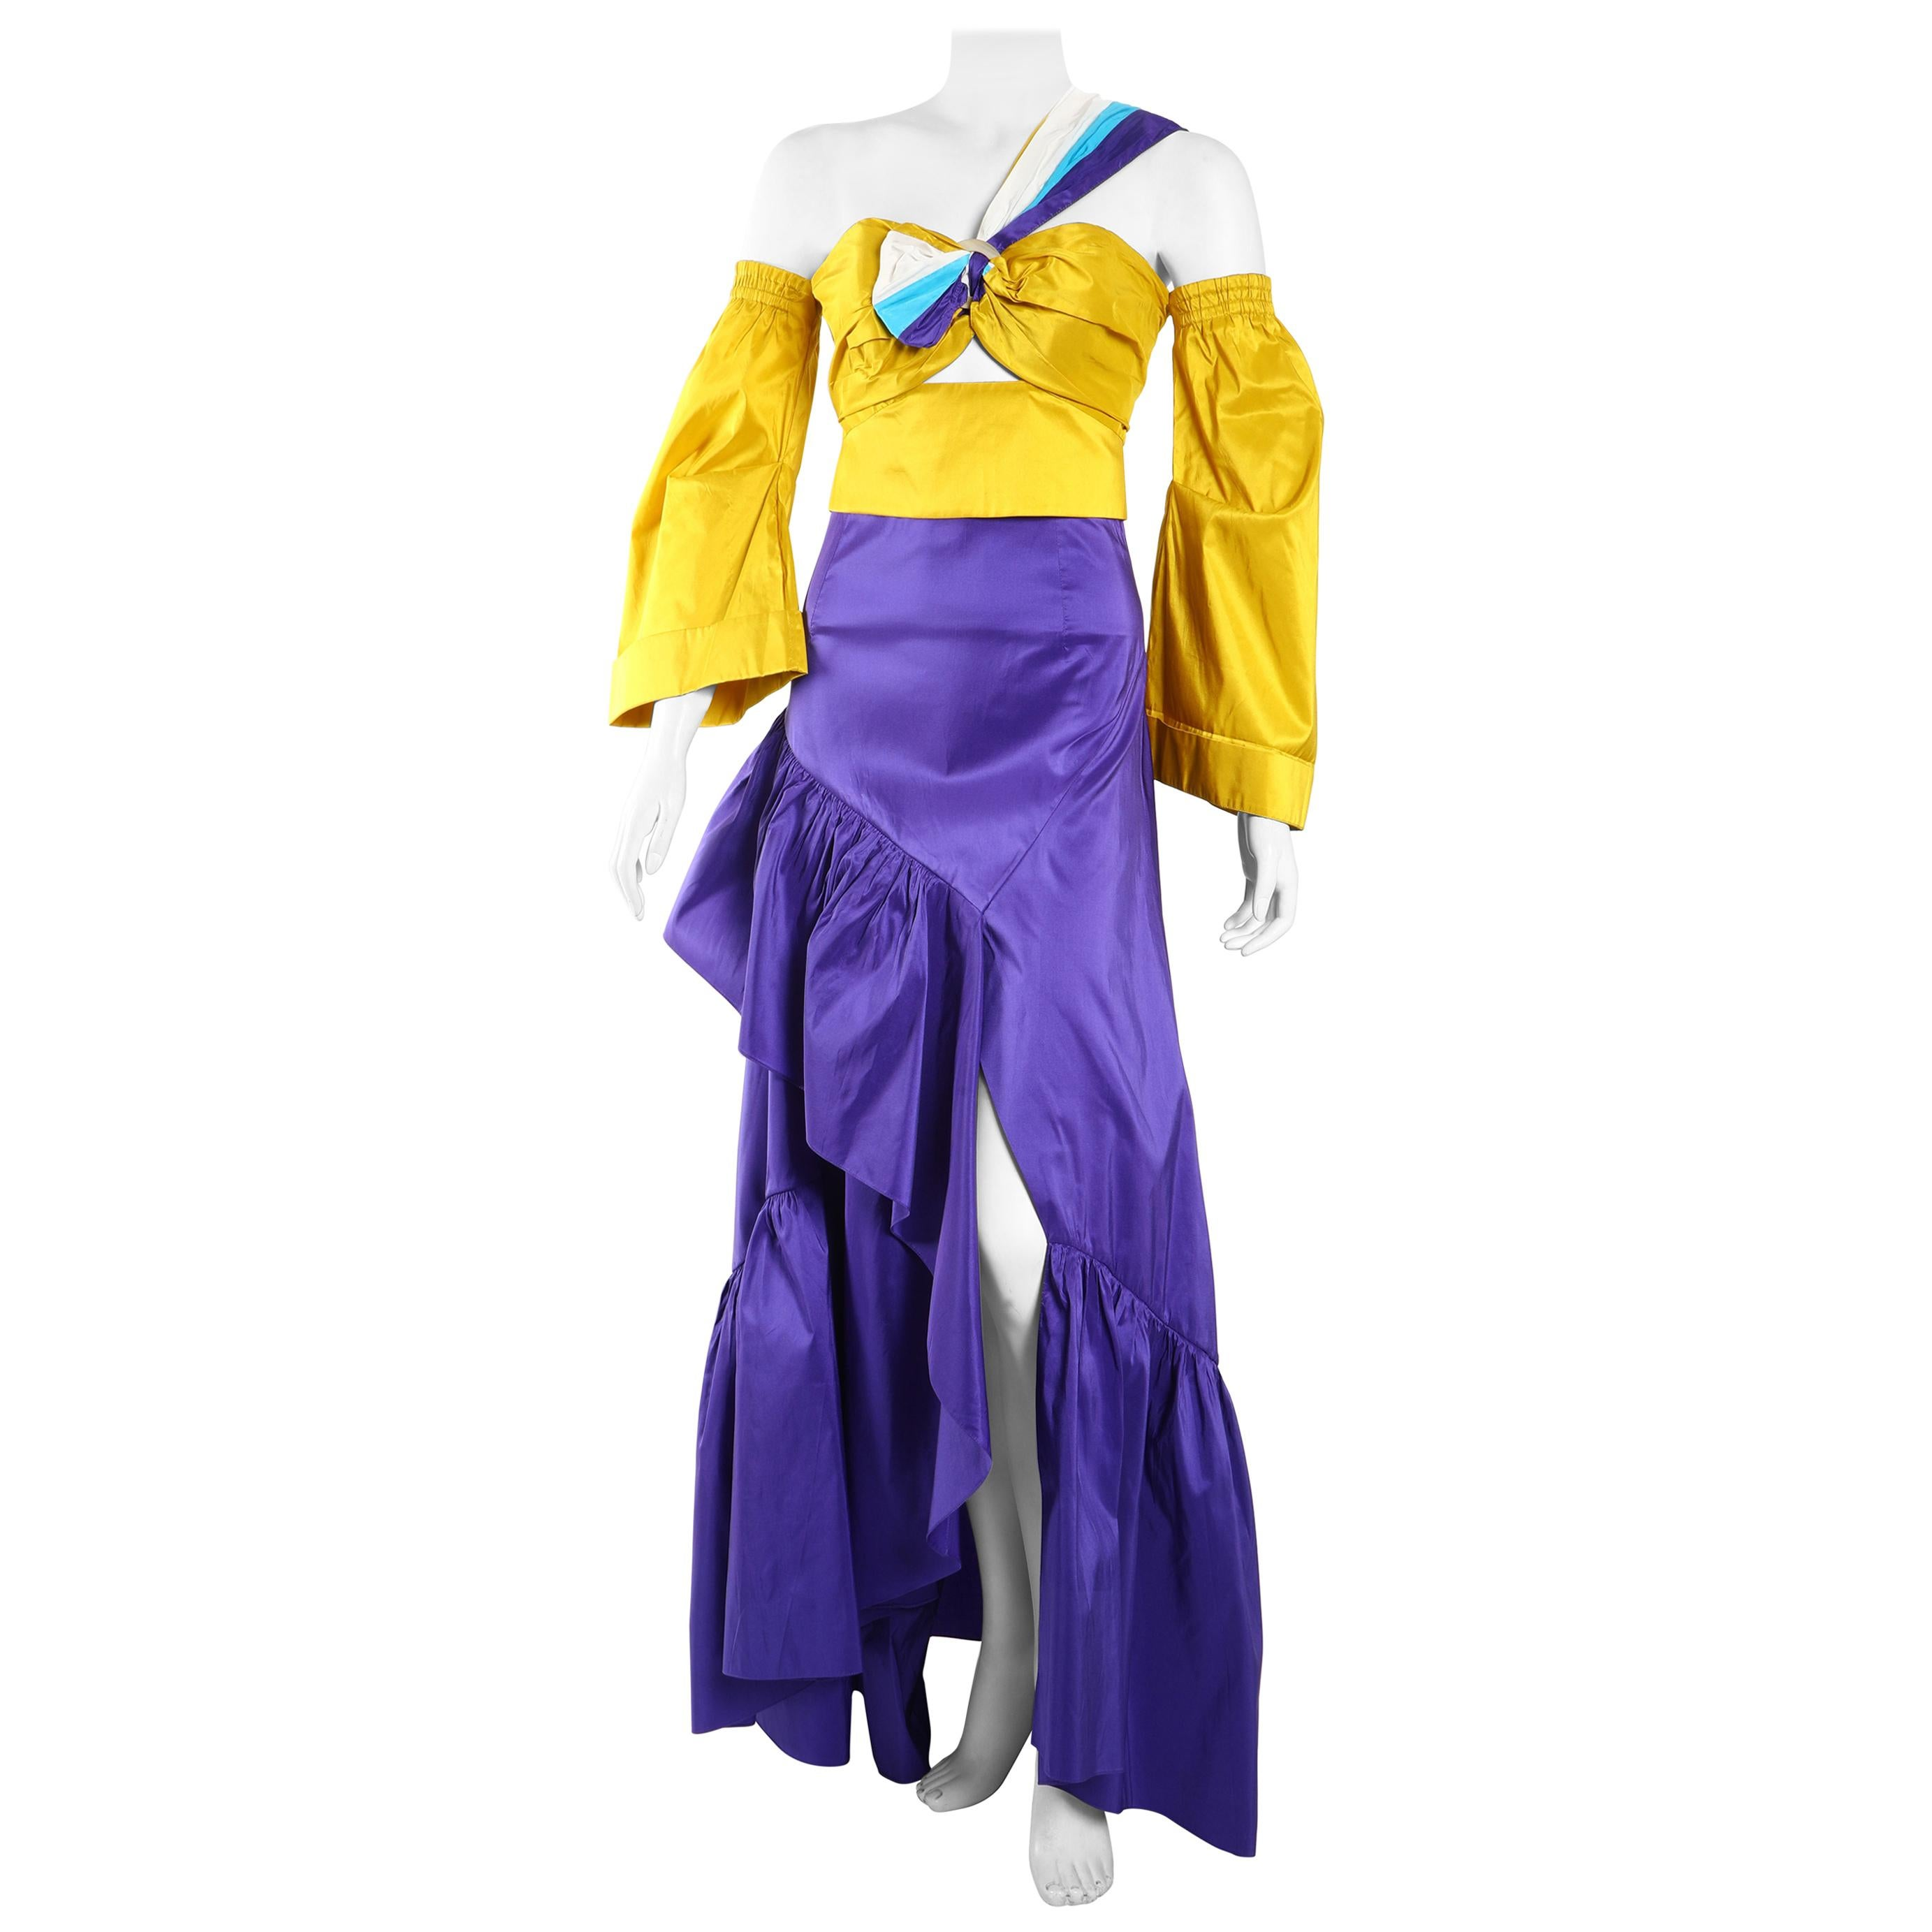 Peter Pilotto Yellow Taffeta Crop Top with Purple Ballroom Skirt